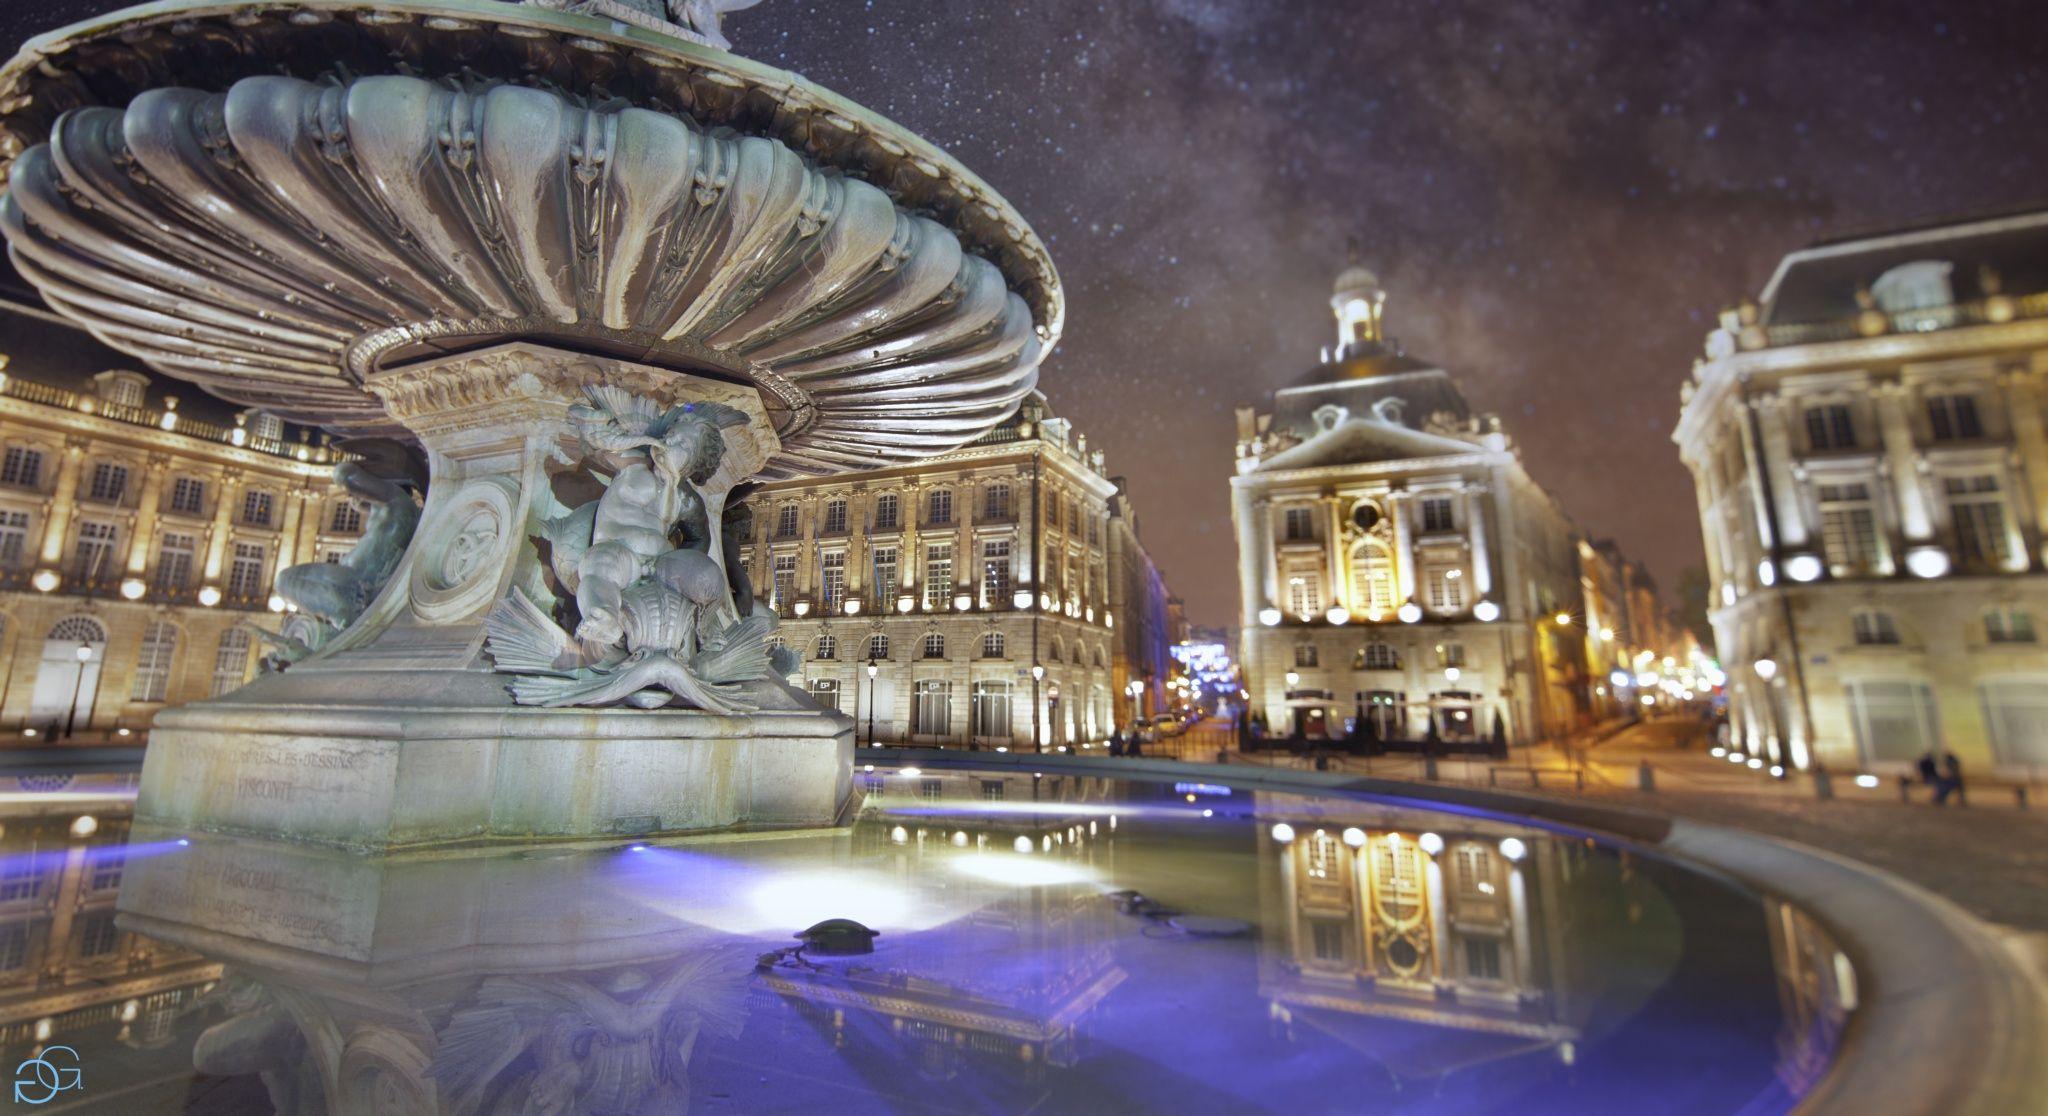 Place de la Bourse by Geoffroy_GROULT on 500px